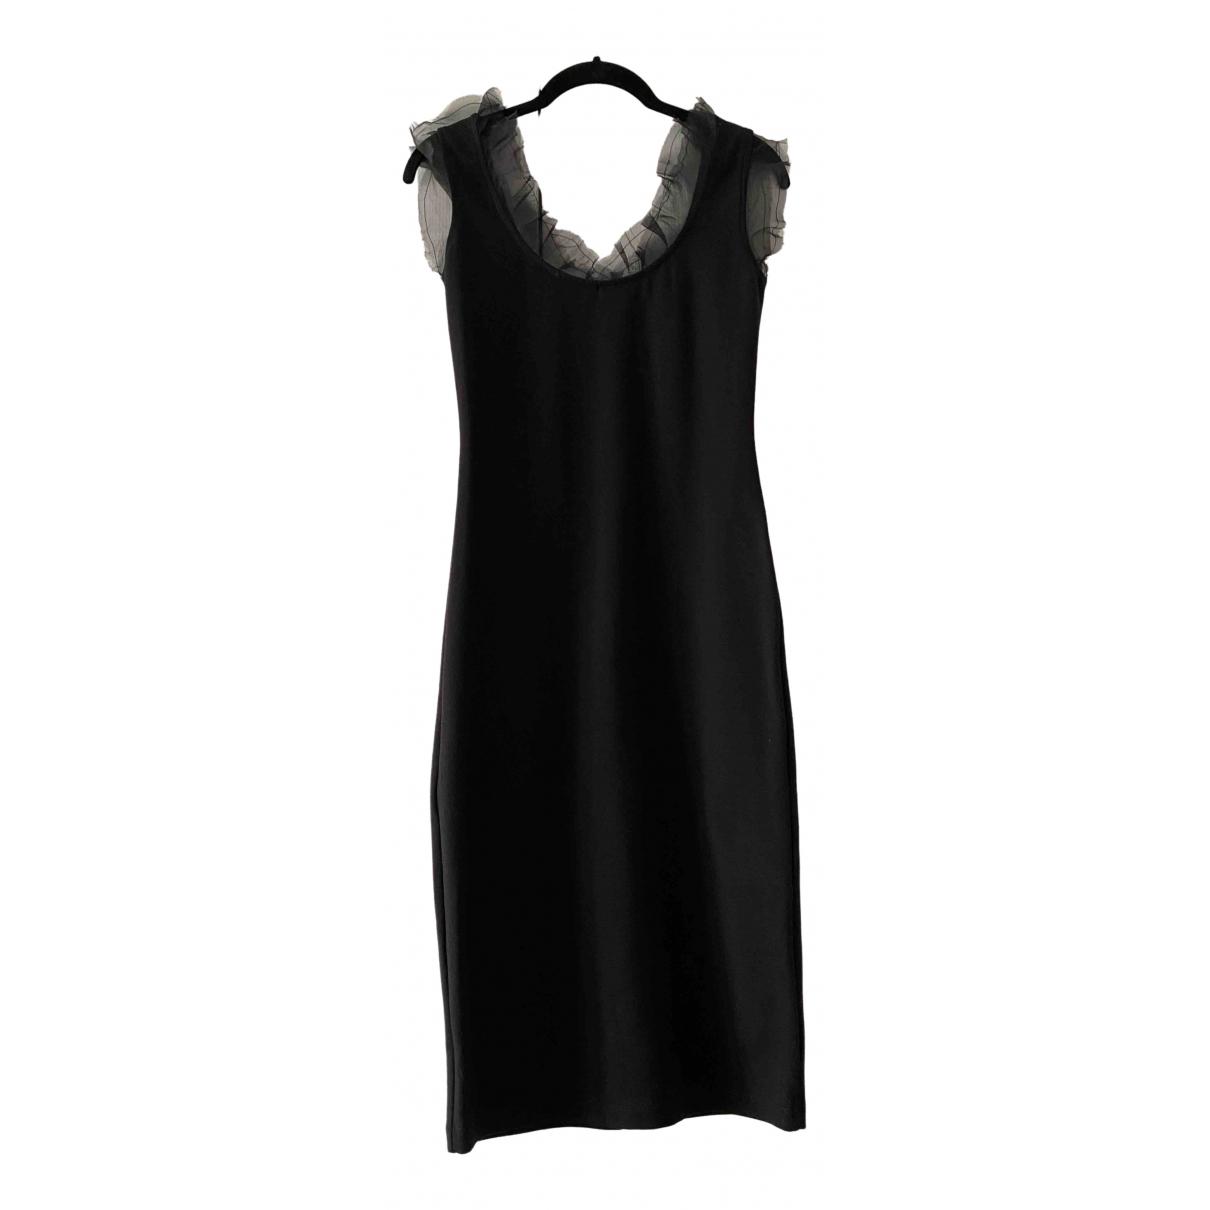 Red Valentino Garavani \N Black dress for Women XS International